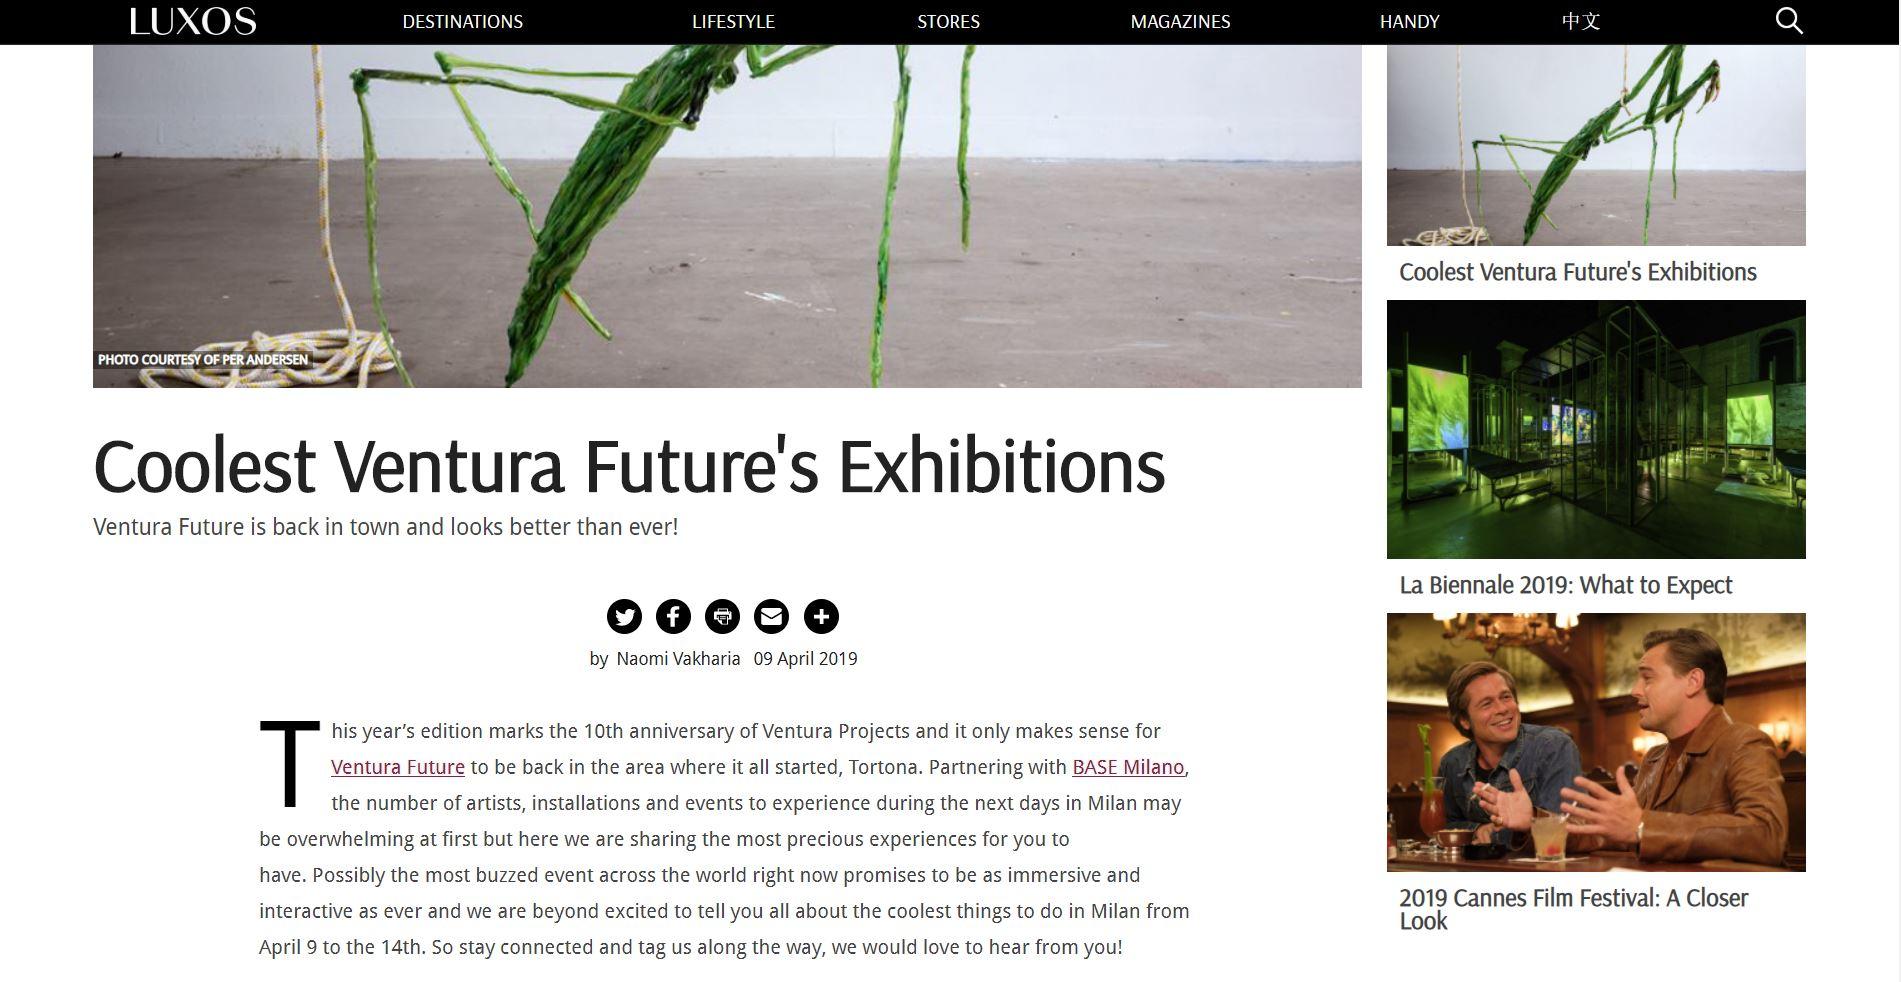 """Coolest Ventura Future's Exhibitions"" - April 2019, LUXOS"